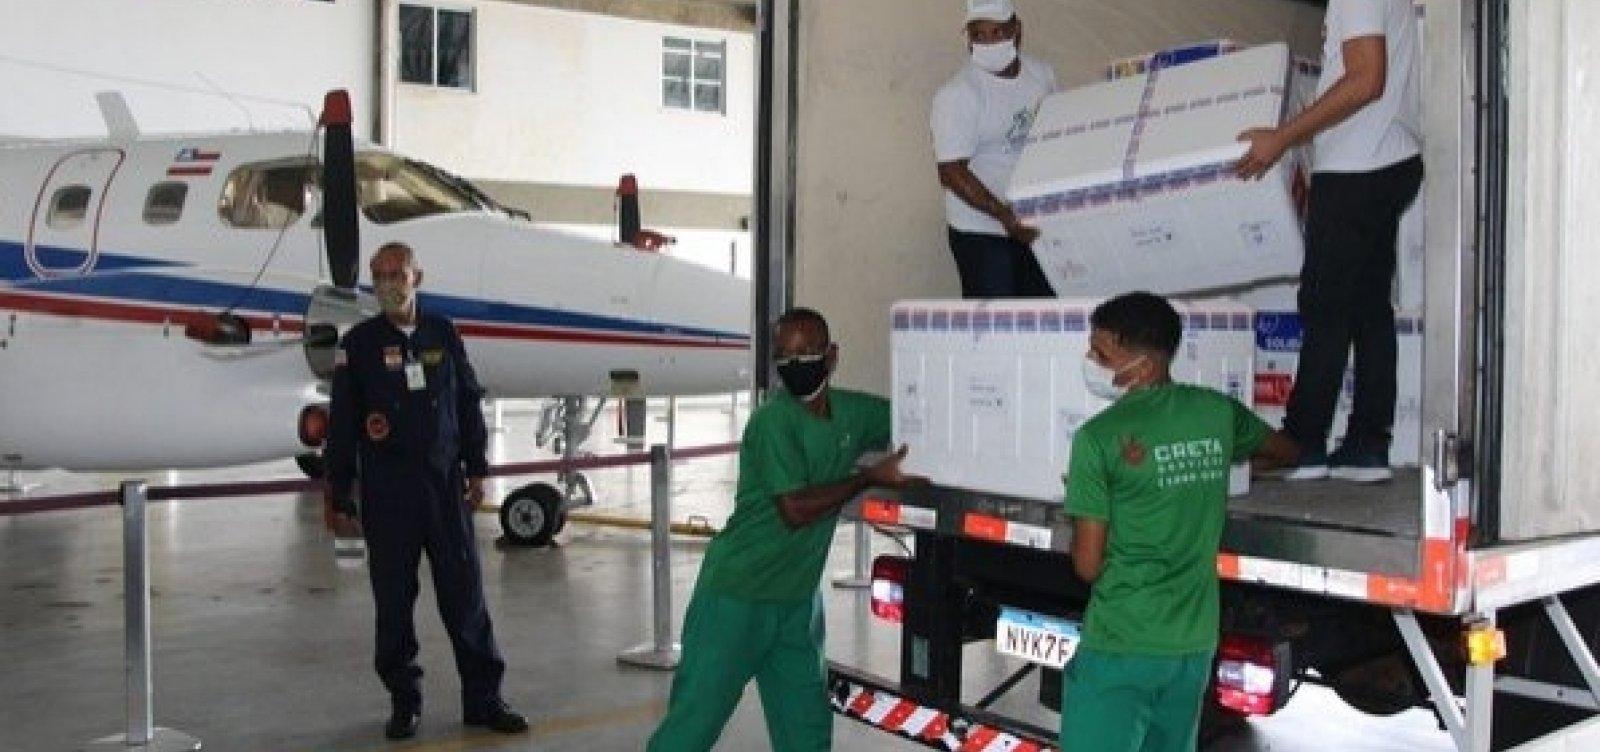 Bahia receberá mais 297.300 doses de vacina contra Covid-19 nesta terça-feira